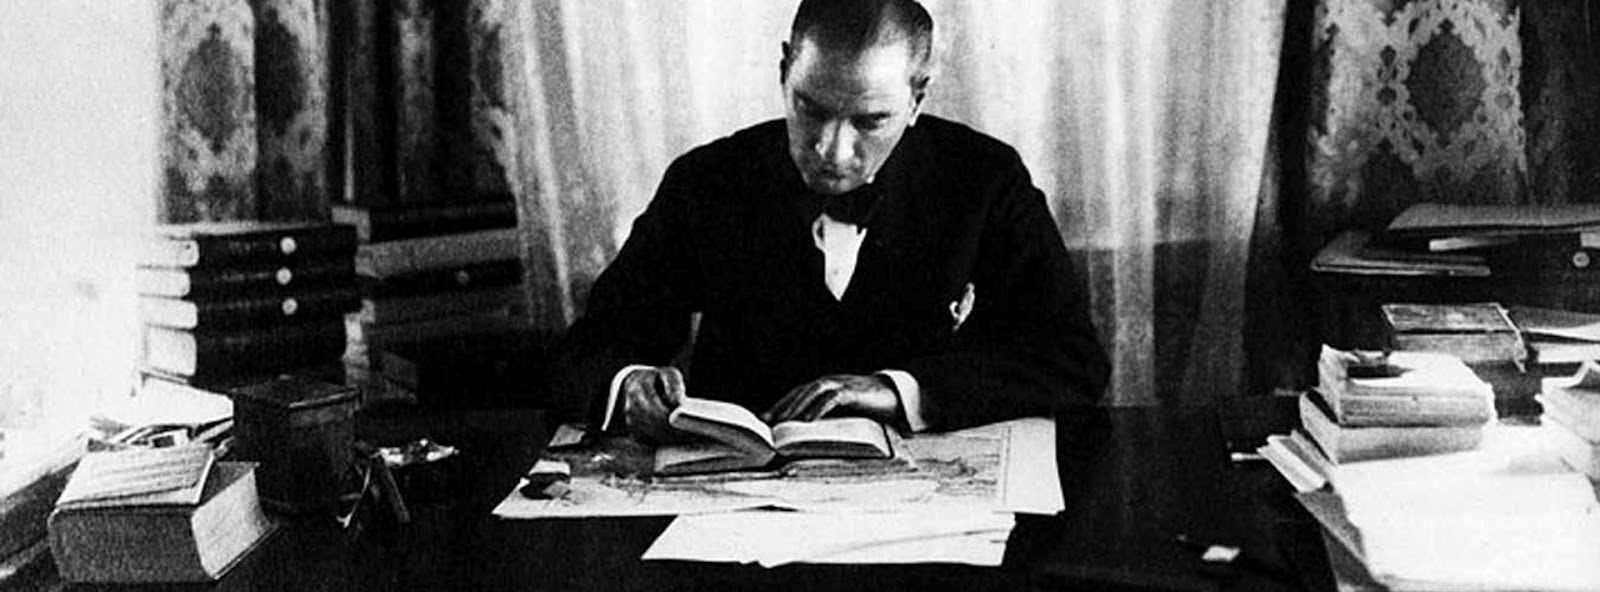 http://3.bp.blogspot.com/-FjiZD68uu64/TzenAZMS21I/AAAAAAAAALM/HLCU9Xk-SBY/s1600/Mustafa_Kemal_Ataturks.jpg